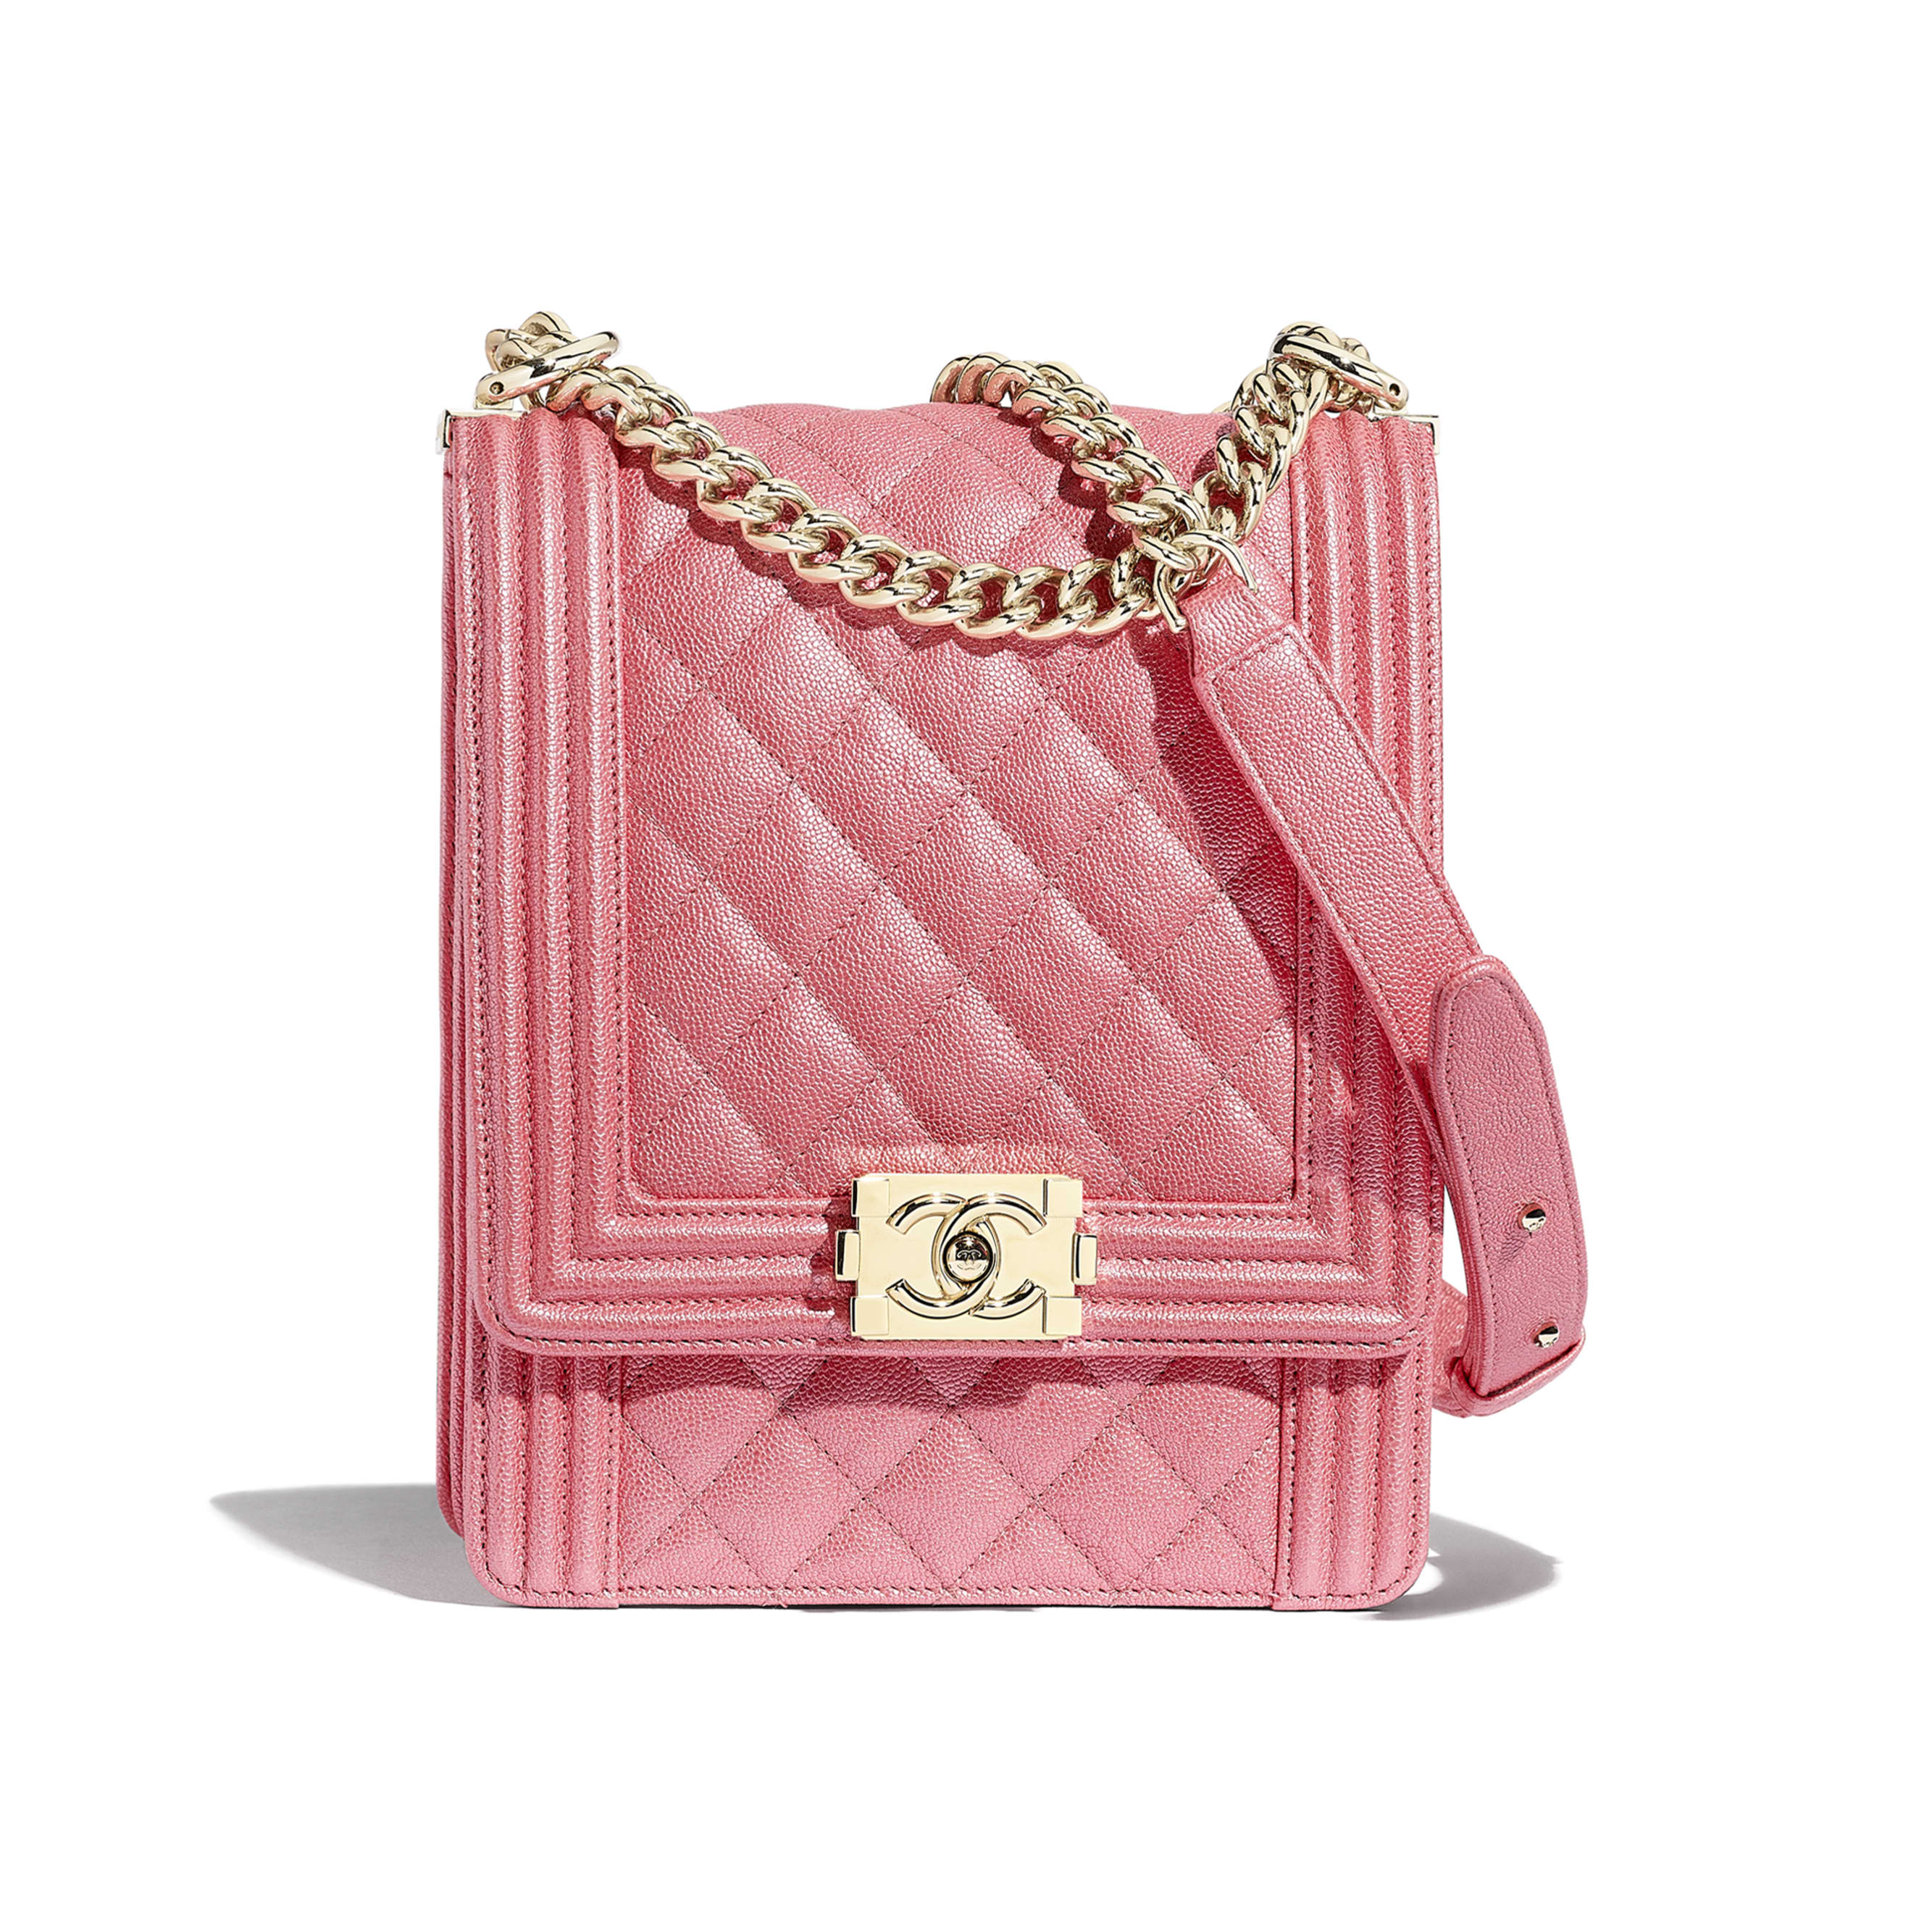 BOY CHANEL Handbag - Pink - Metallic Grained Calfskin & Gold-Tone Metal - Default view - see standard sized version